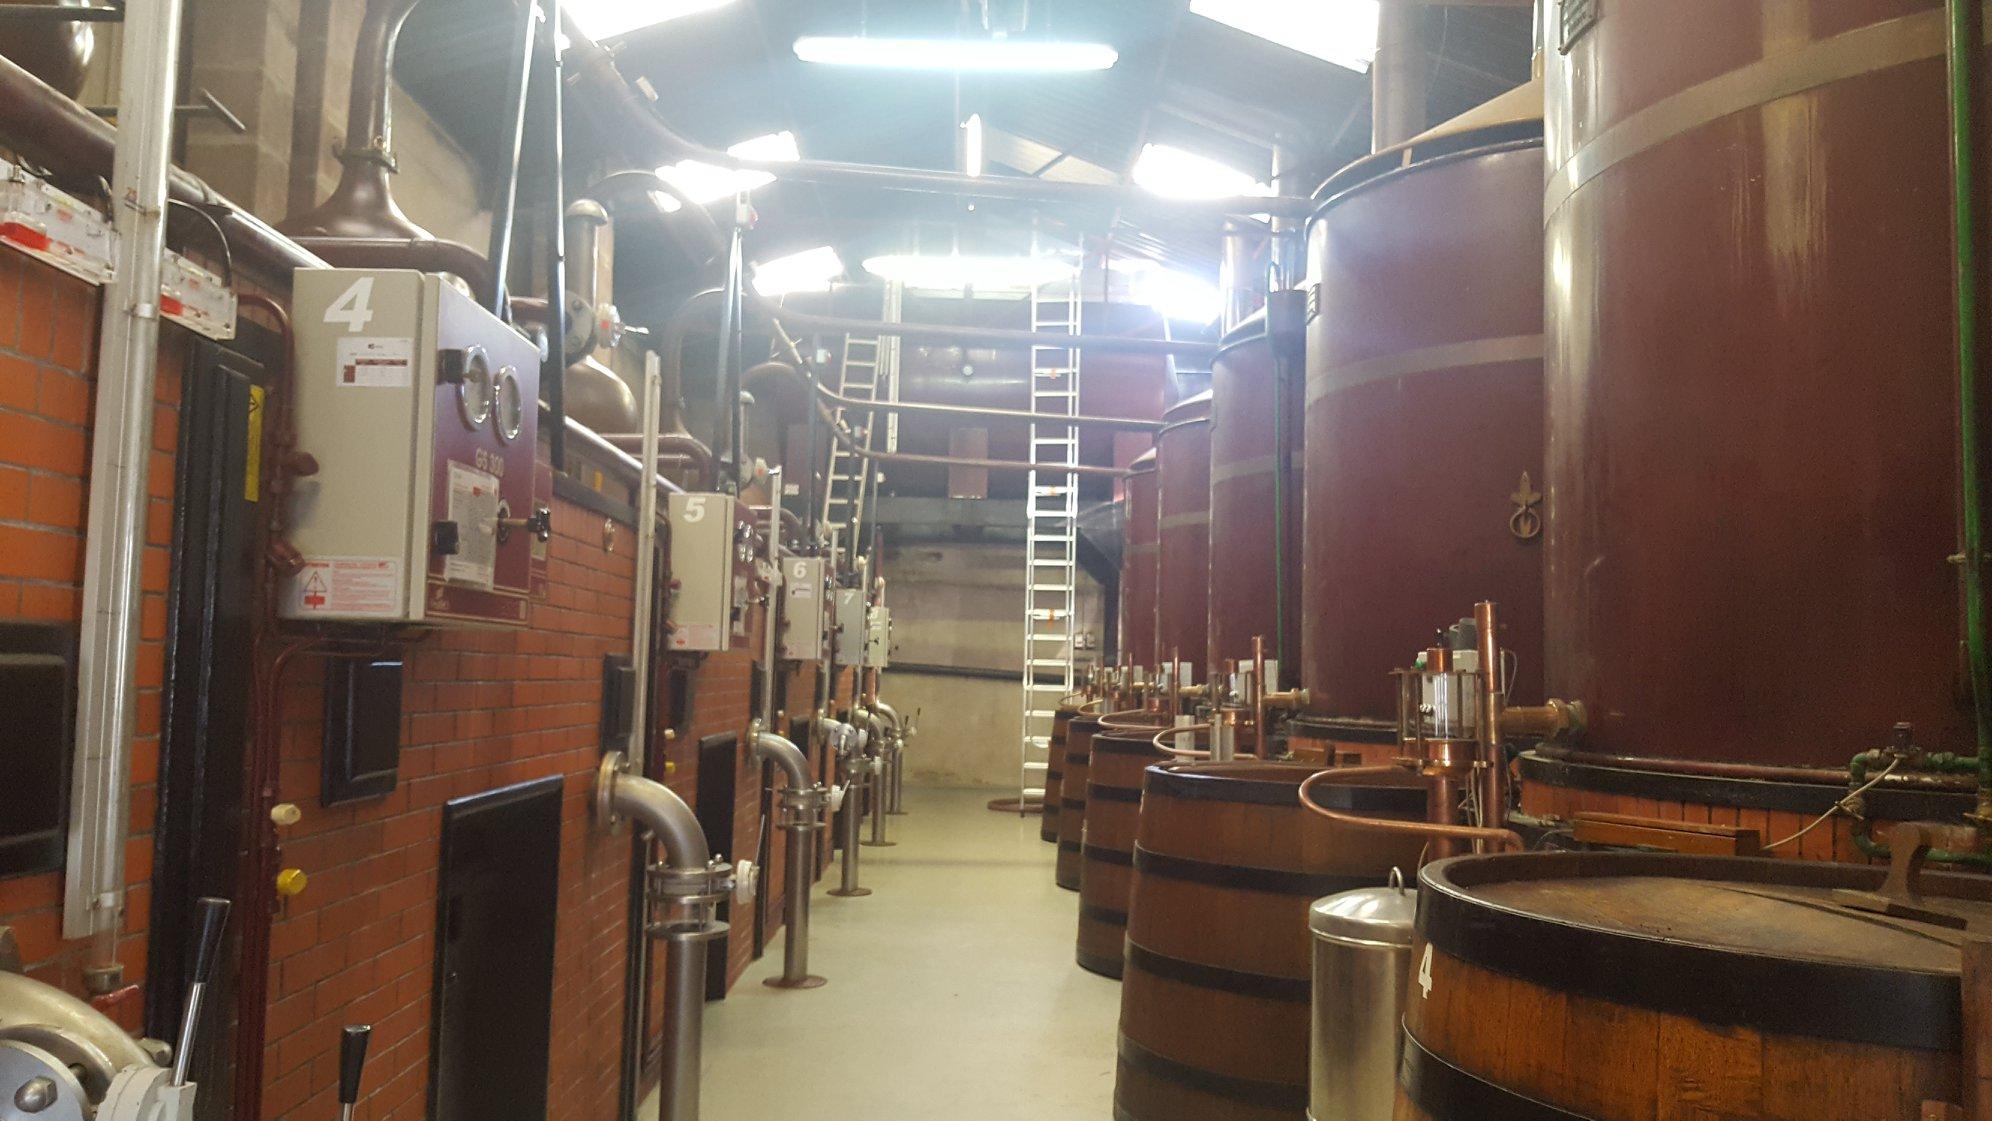 Distillerie Le logis d'Angeac - Angeac-Charente